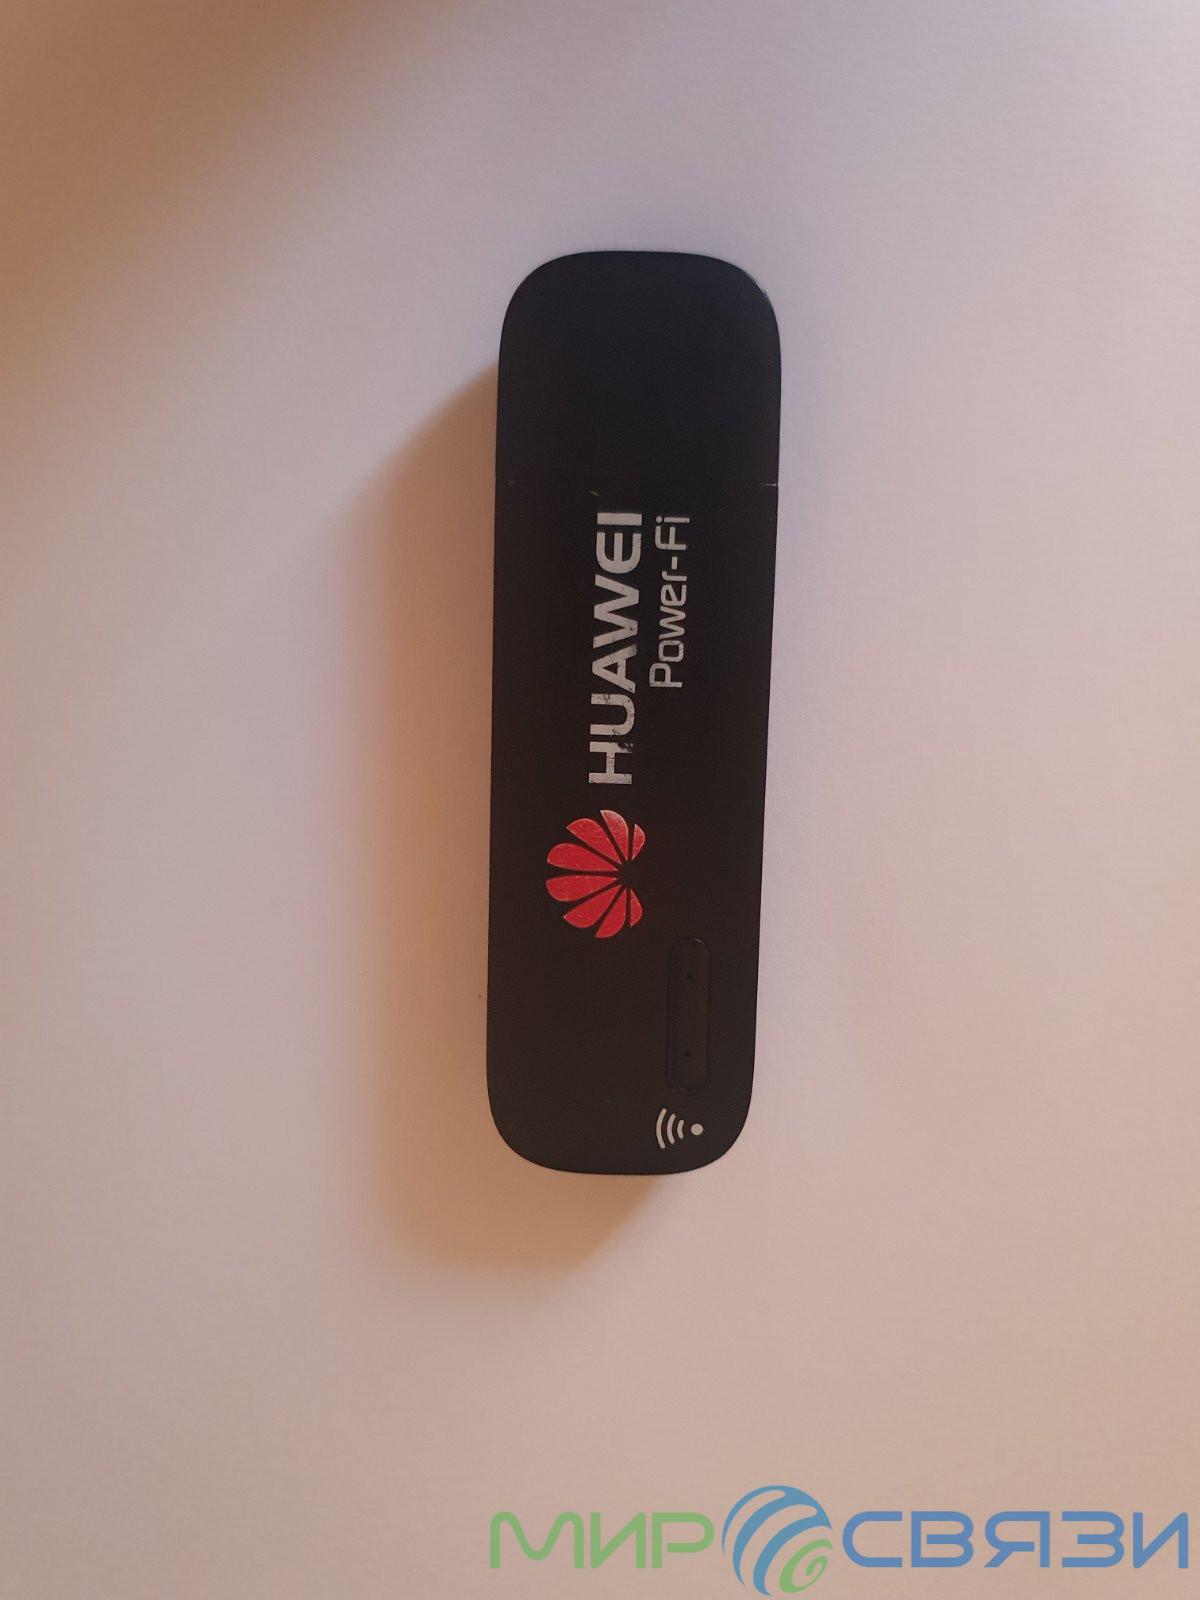 Huawei E8221s-1 USB роутер 3G/UMTS/HSDPA/HSPA+